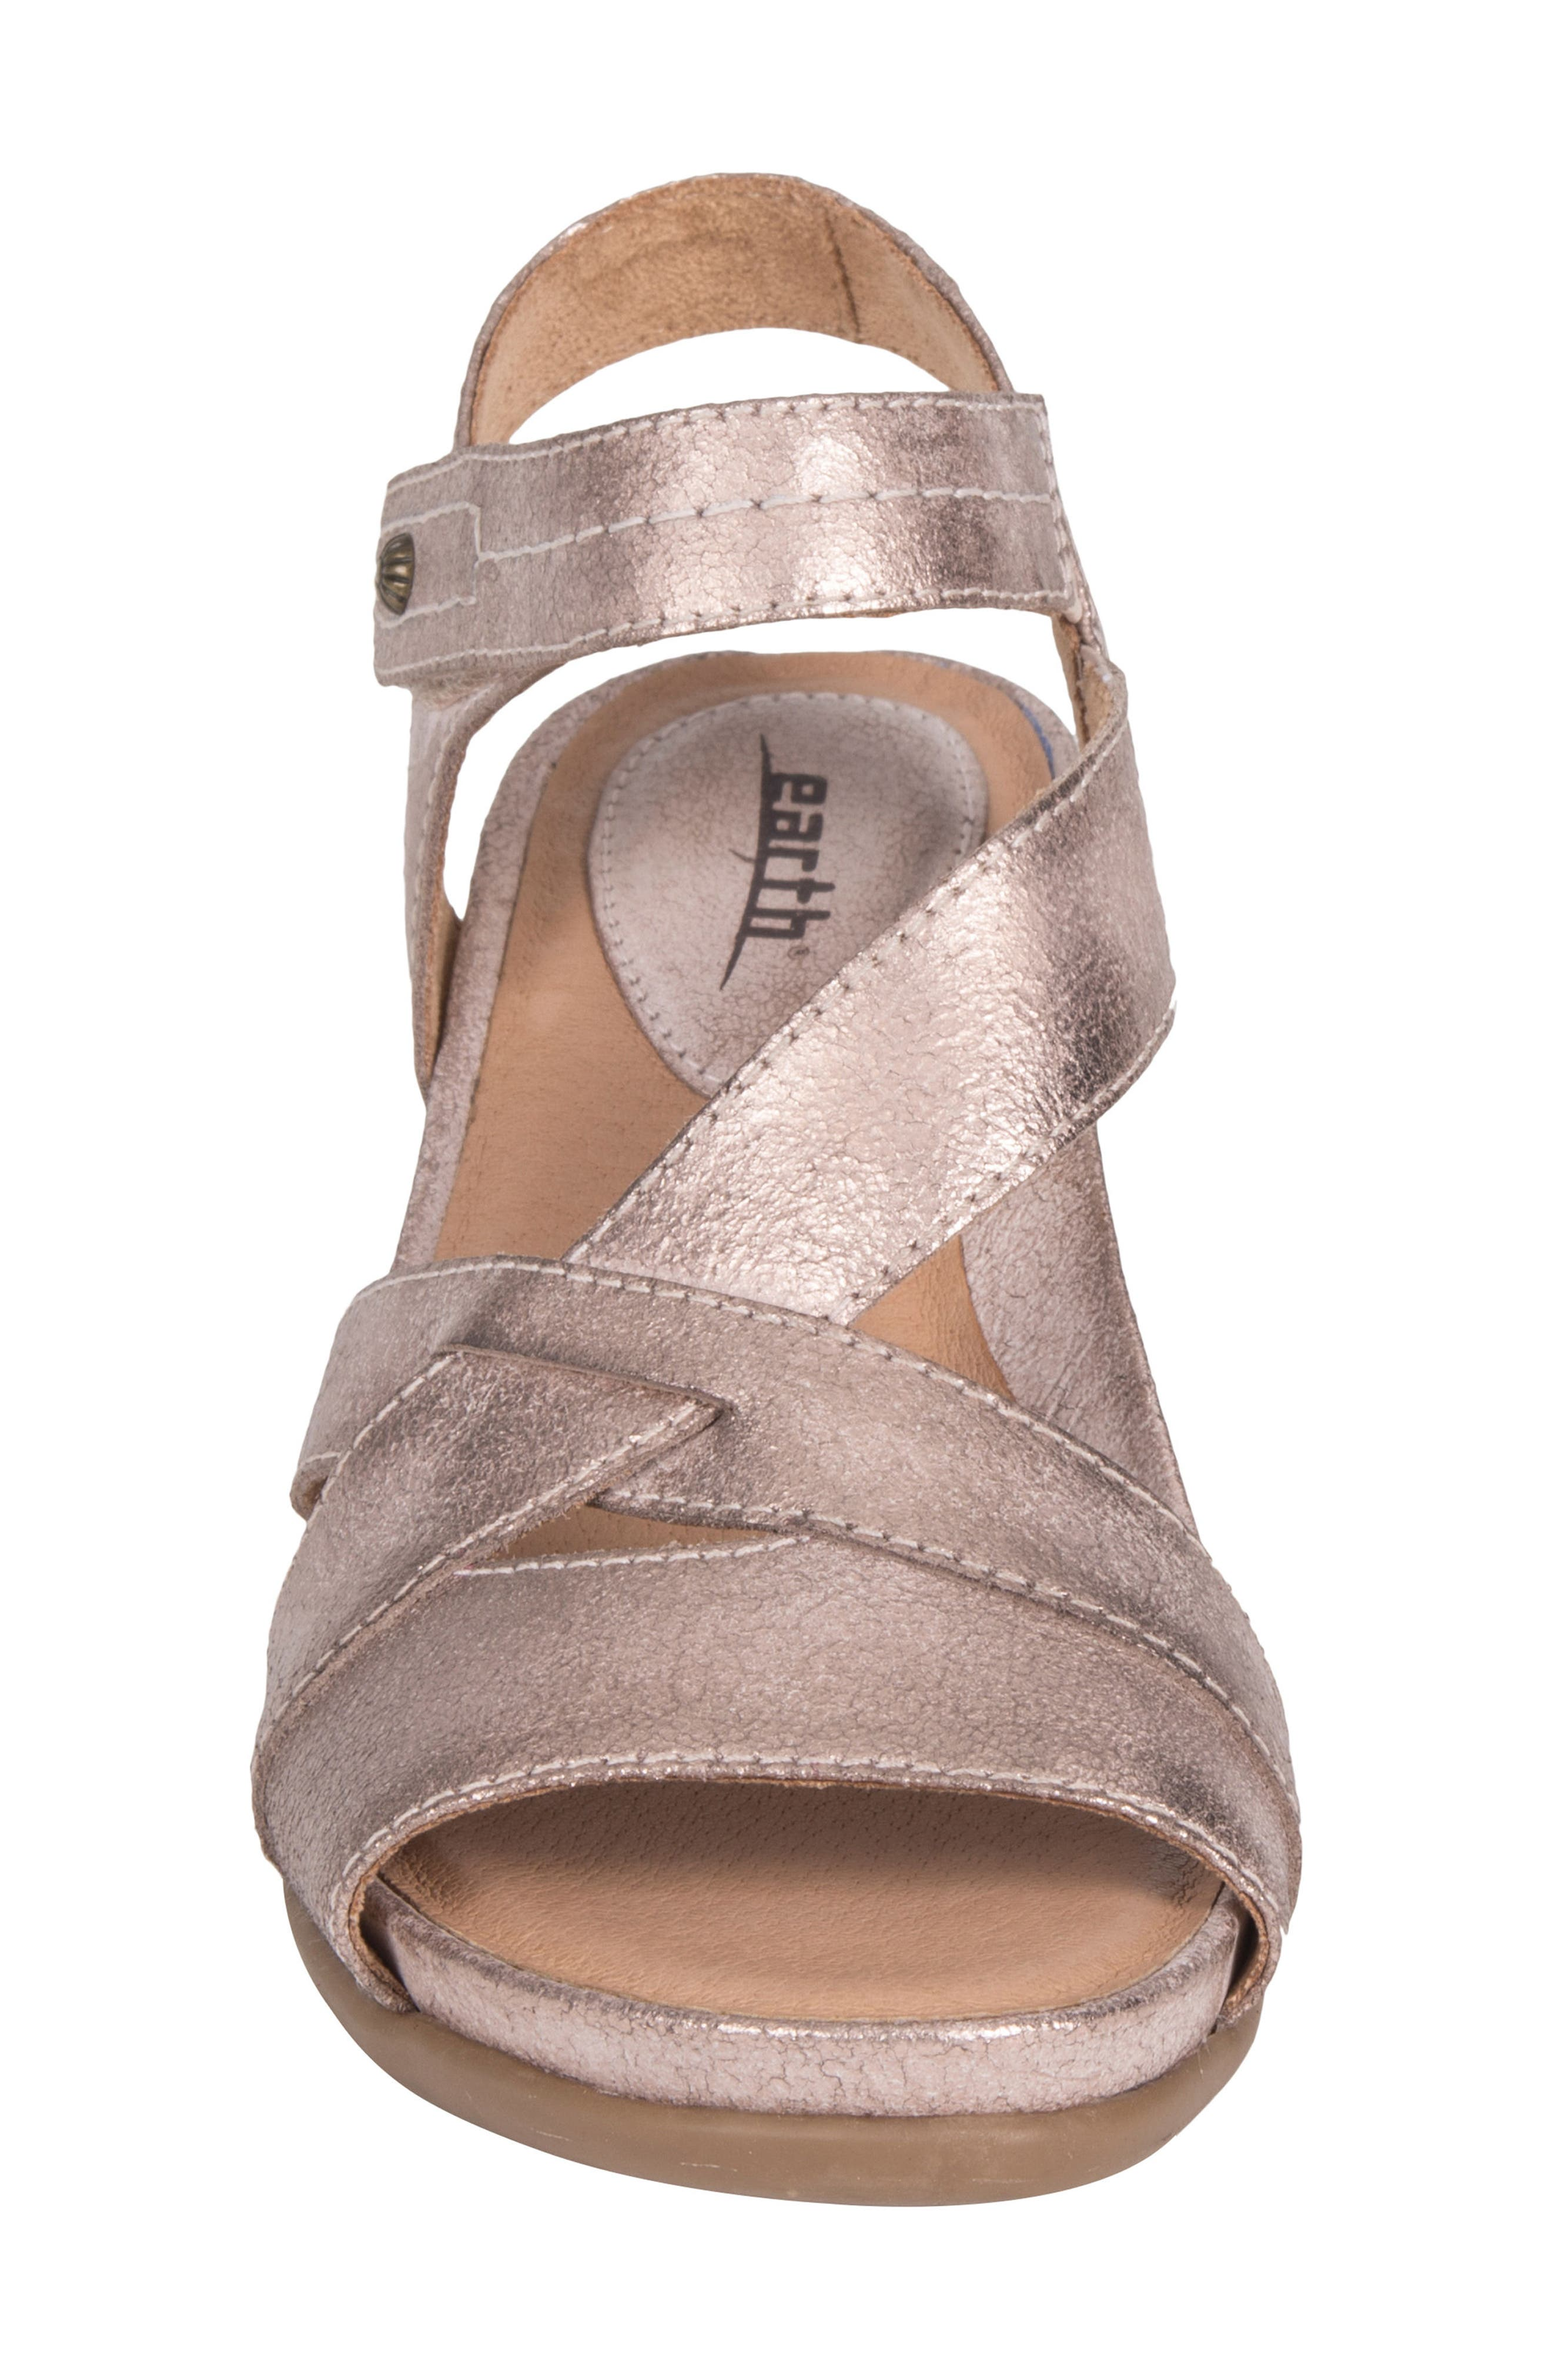 Thistle Wedge Sandal,                             Alternate thumbnail 16, color,